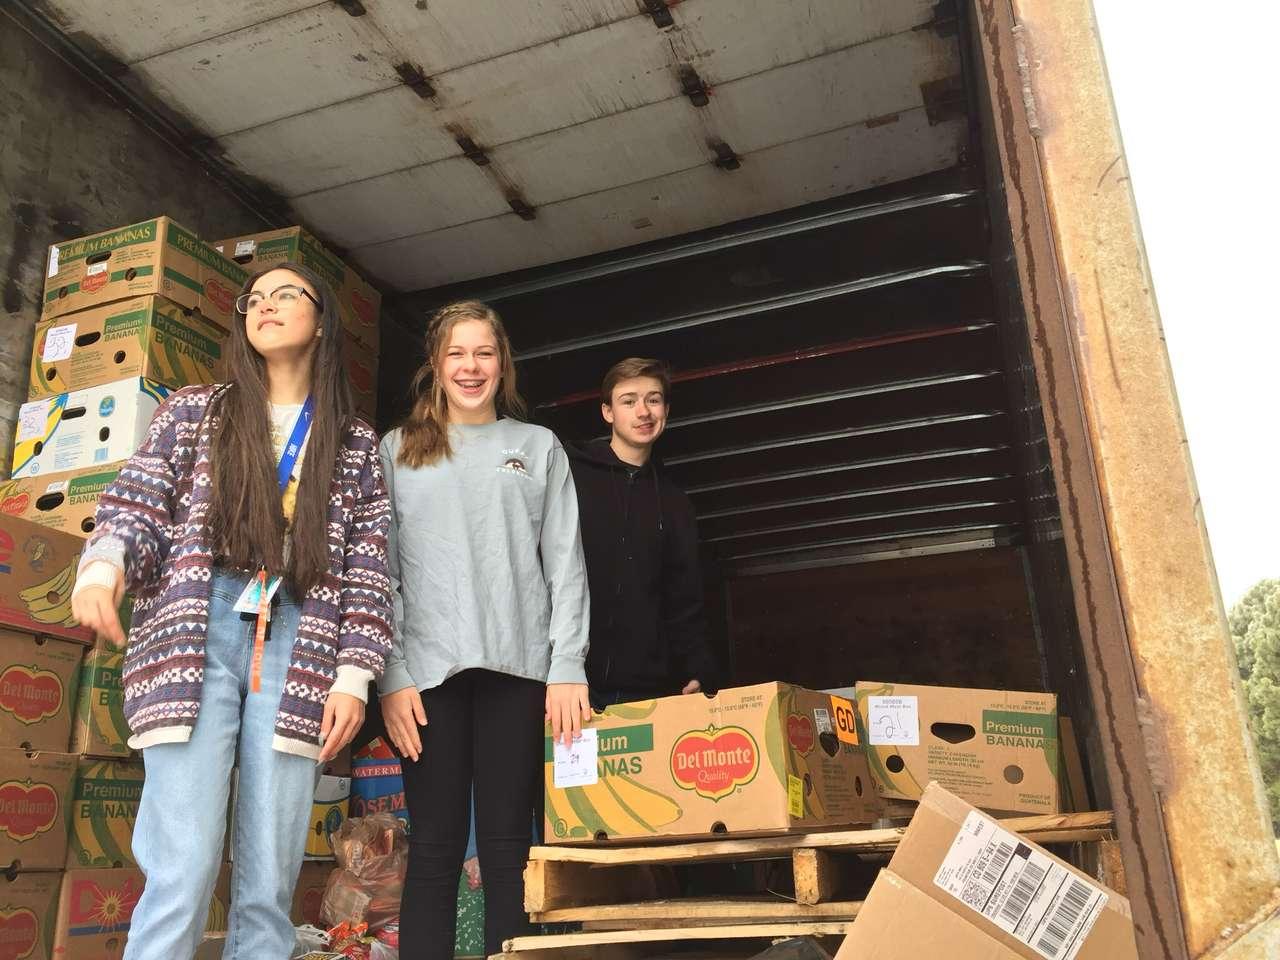 Michael Kirkpatrick, Catie Taylor, and Koki Davis load donated food into the Harvest of Love semi-truck.